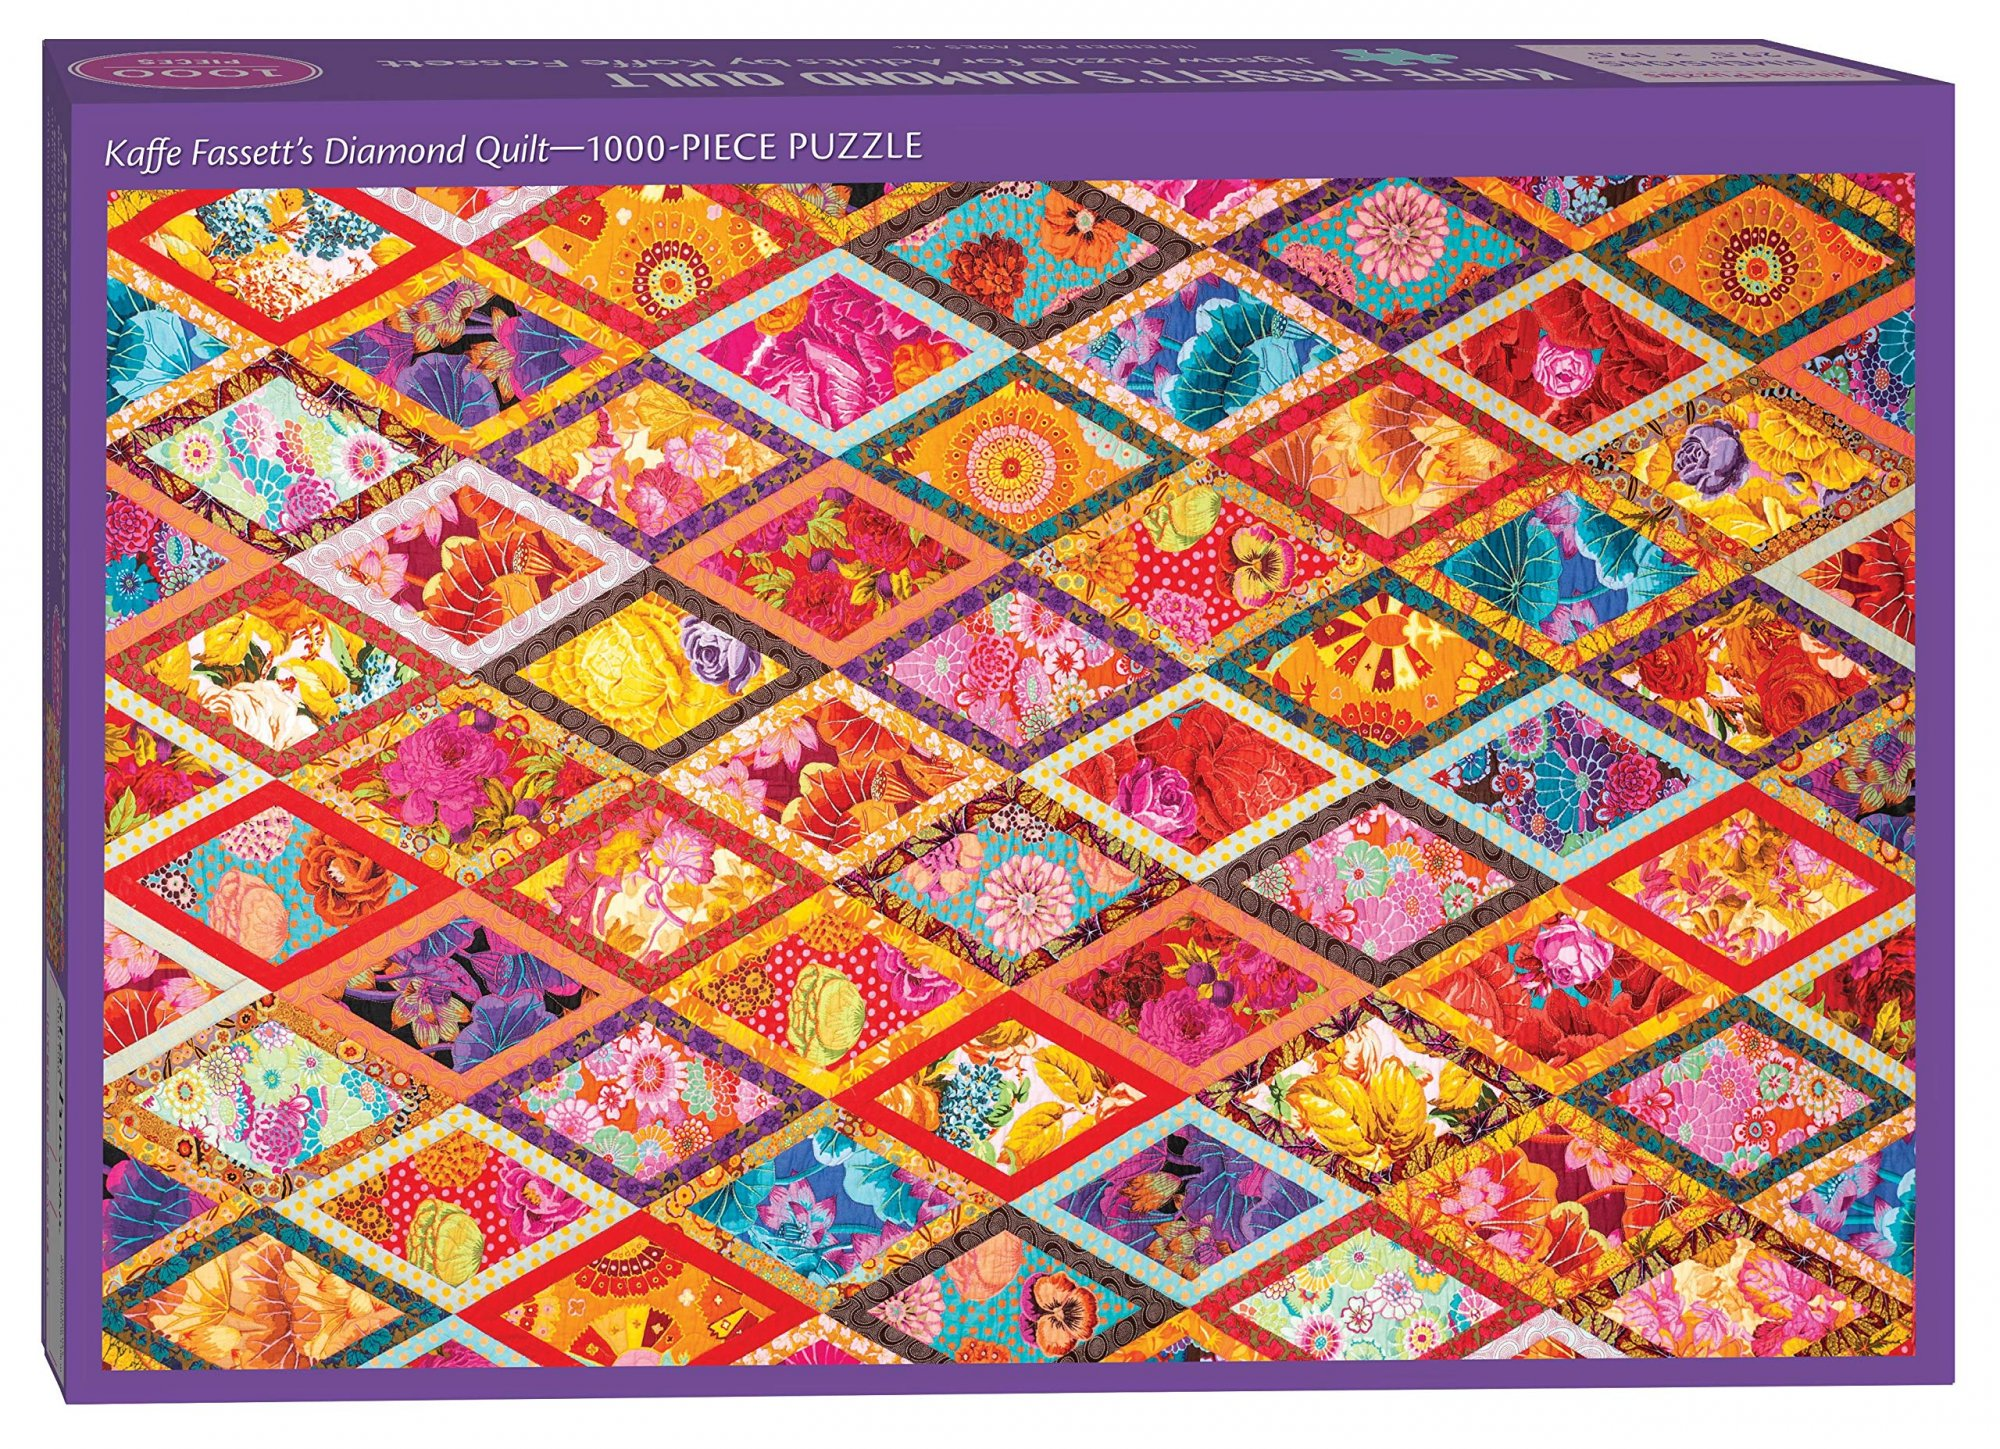 Kaffe Fassett's Diamond Quilt Jigsaw Puzzle for Adults - 1000pc